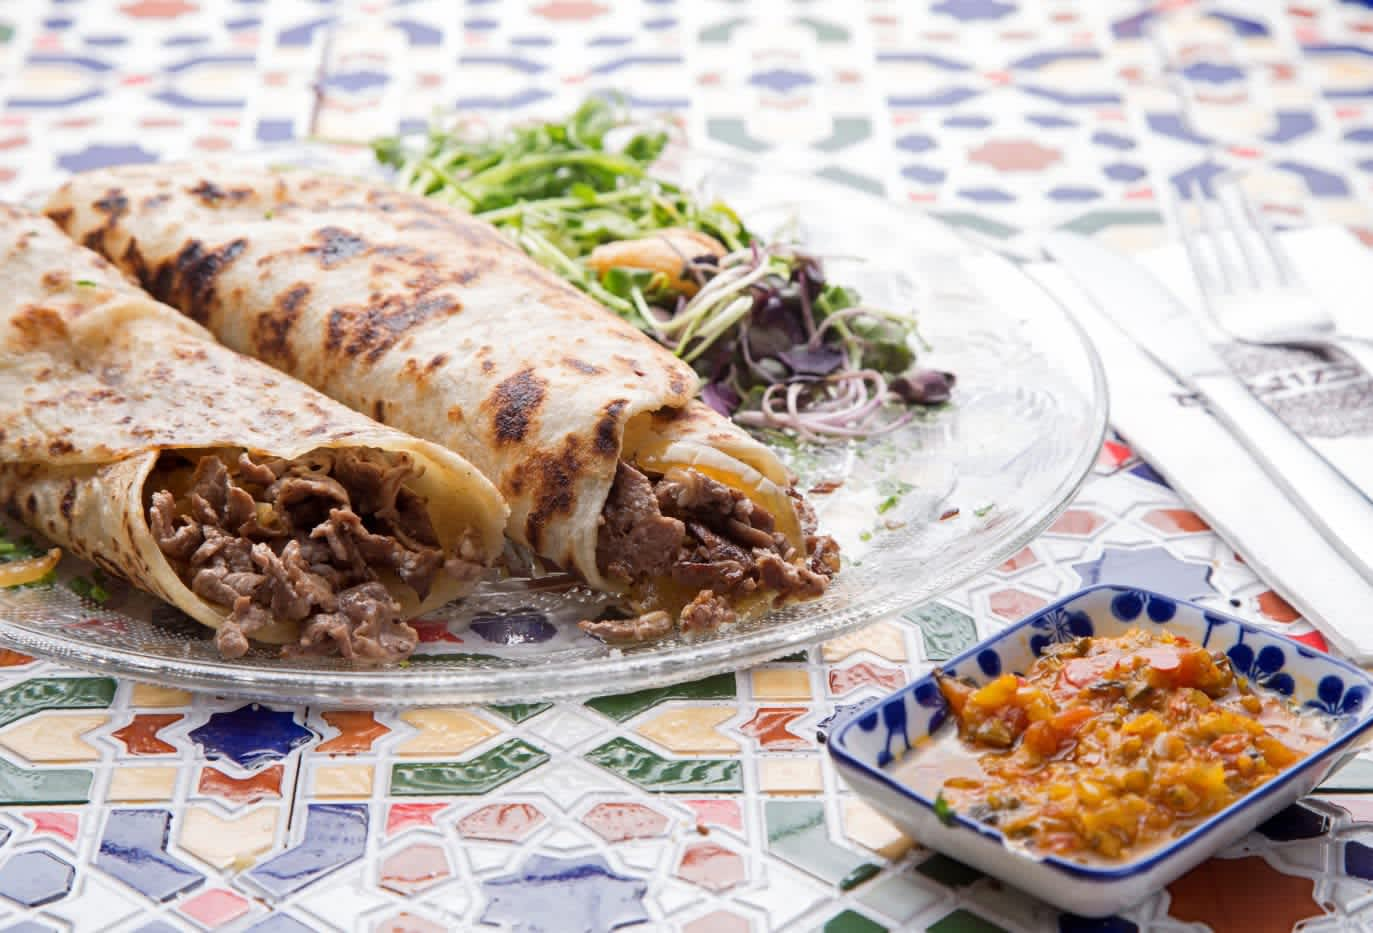 Savory moufleta crepes stuffed with chopped steak. (DAN LEV)